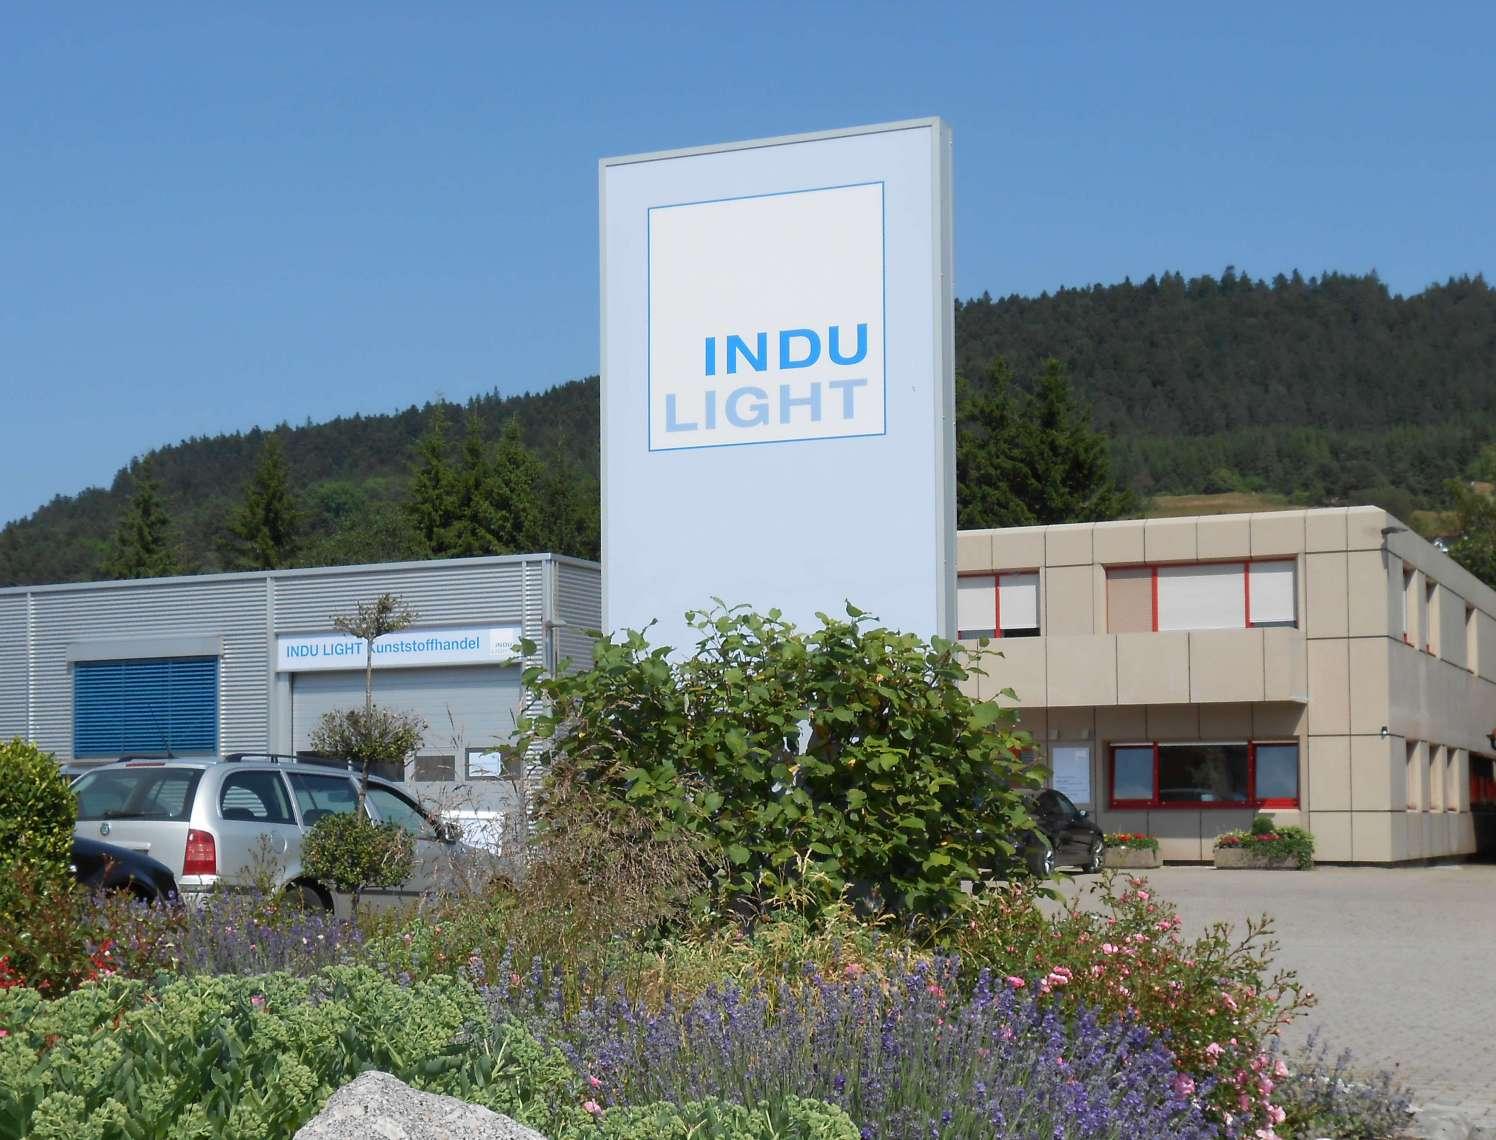 Indu Light company building in Deilingen